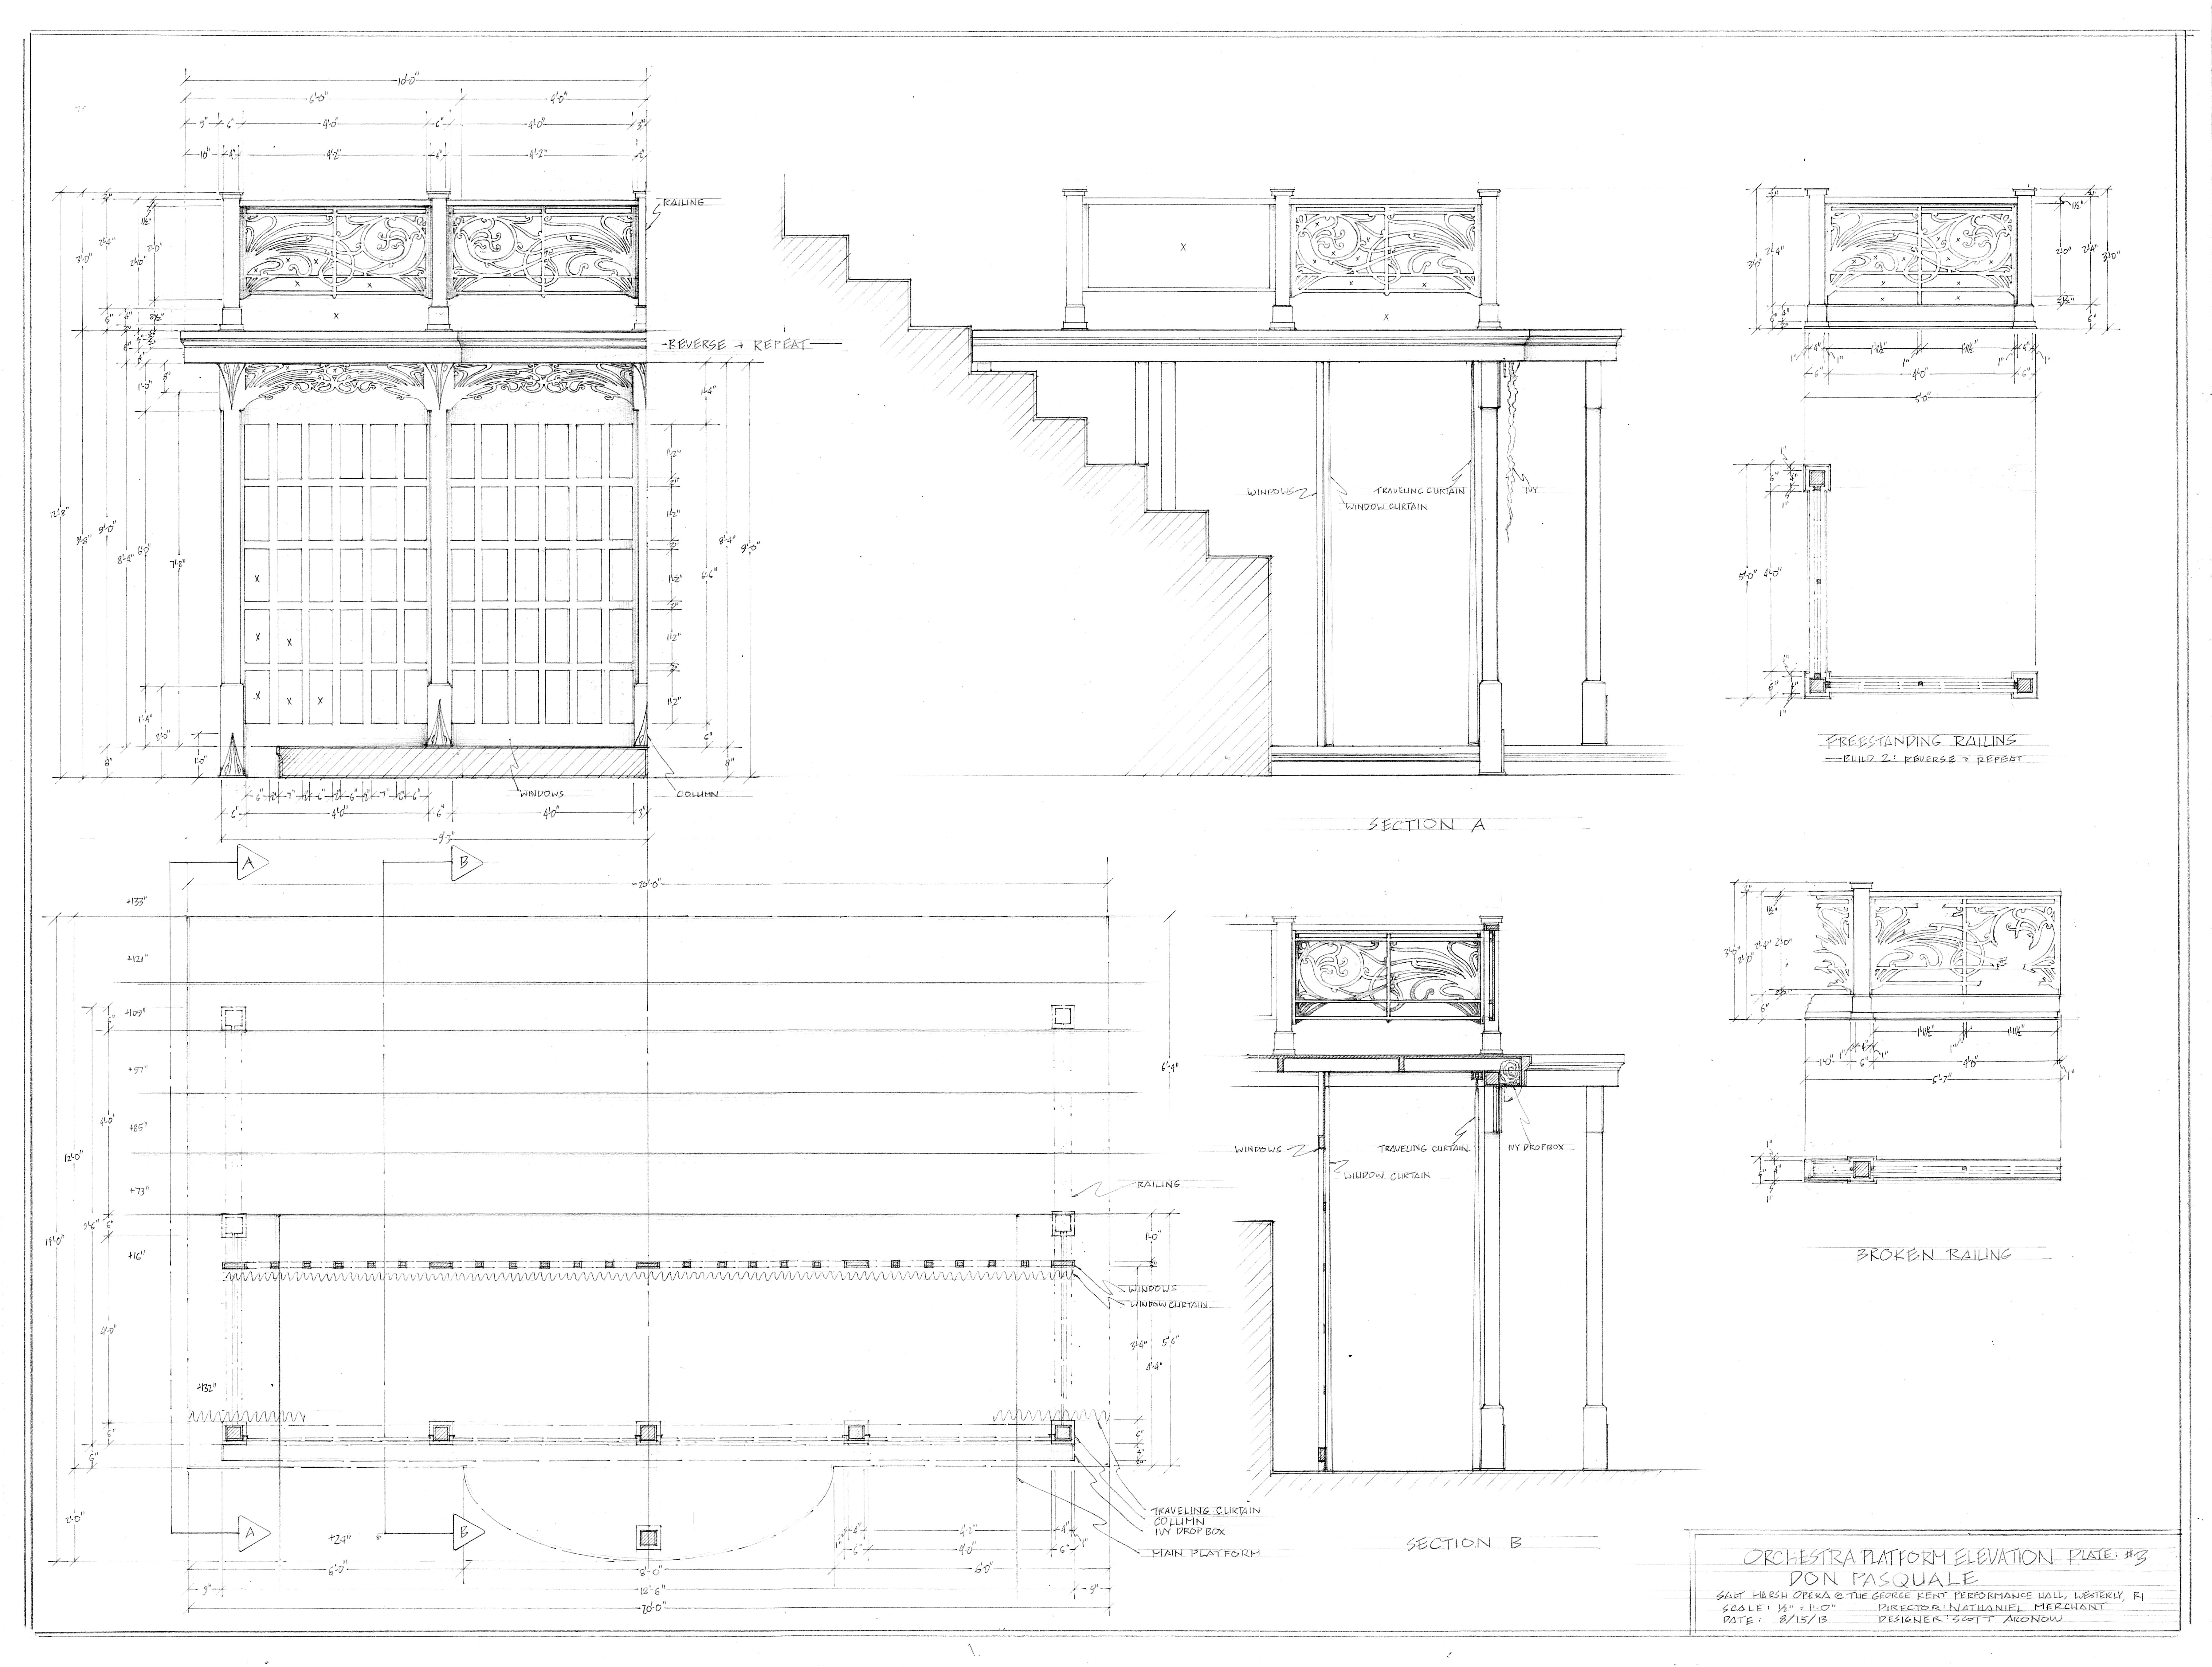 Plate #3. Orchestra Platform Elevation, RI